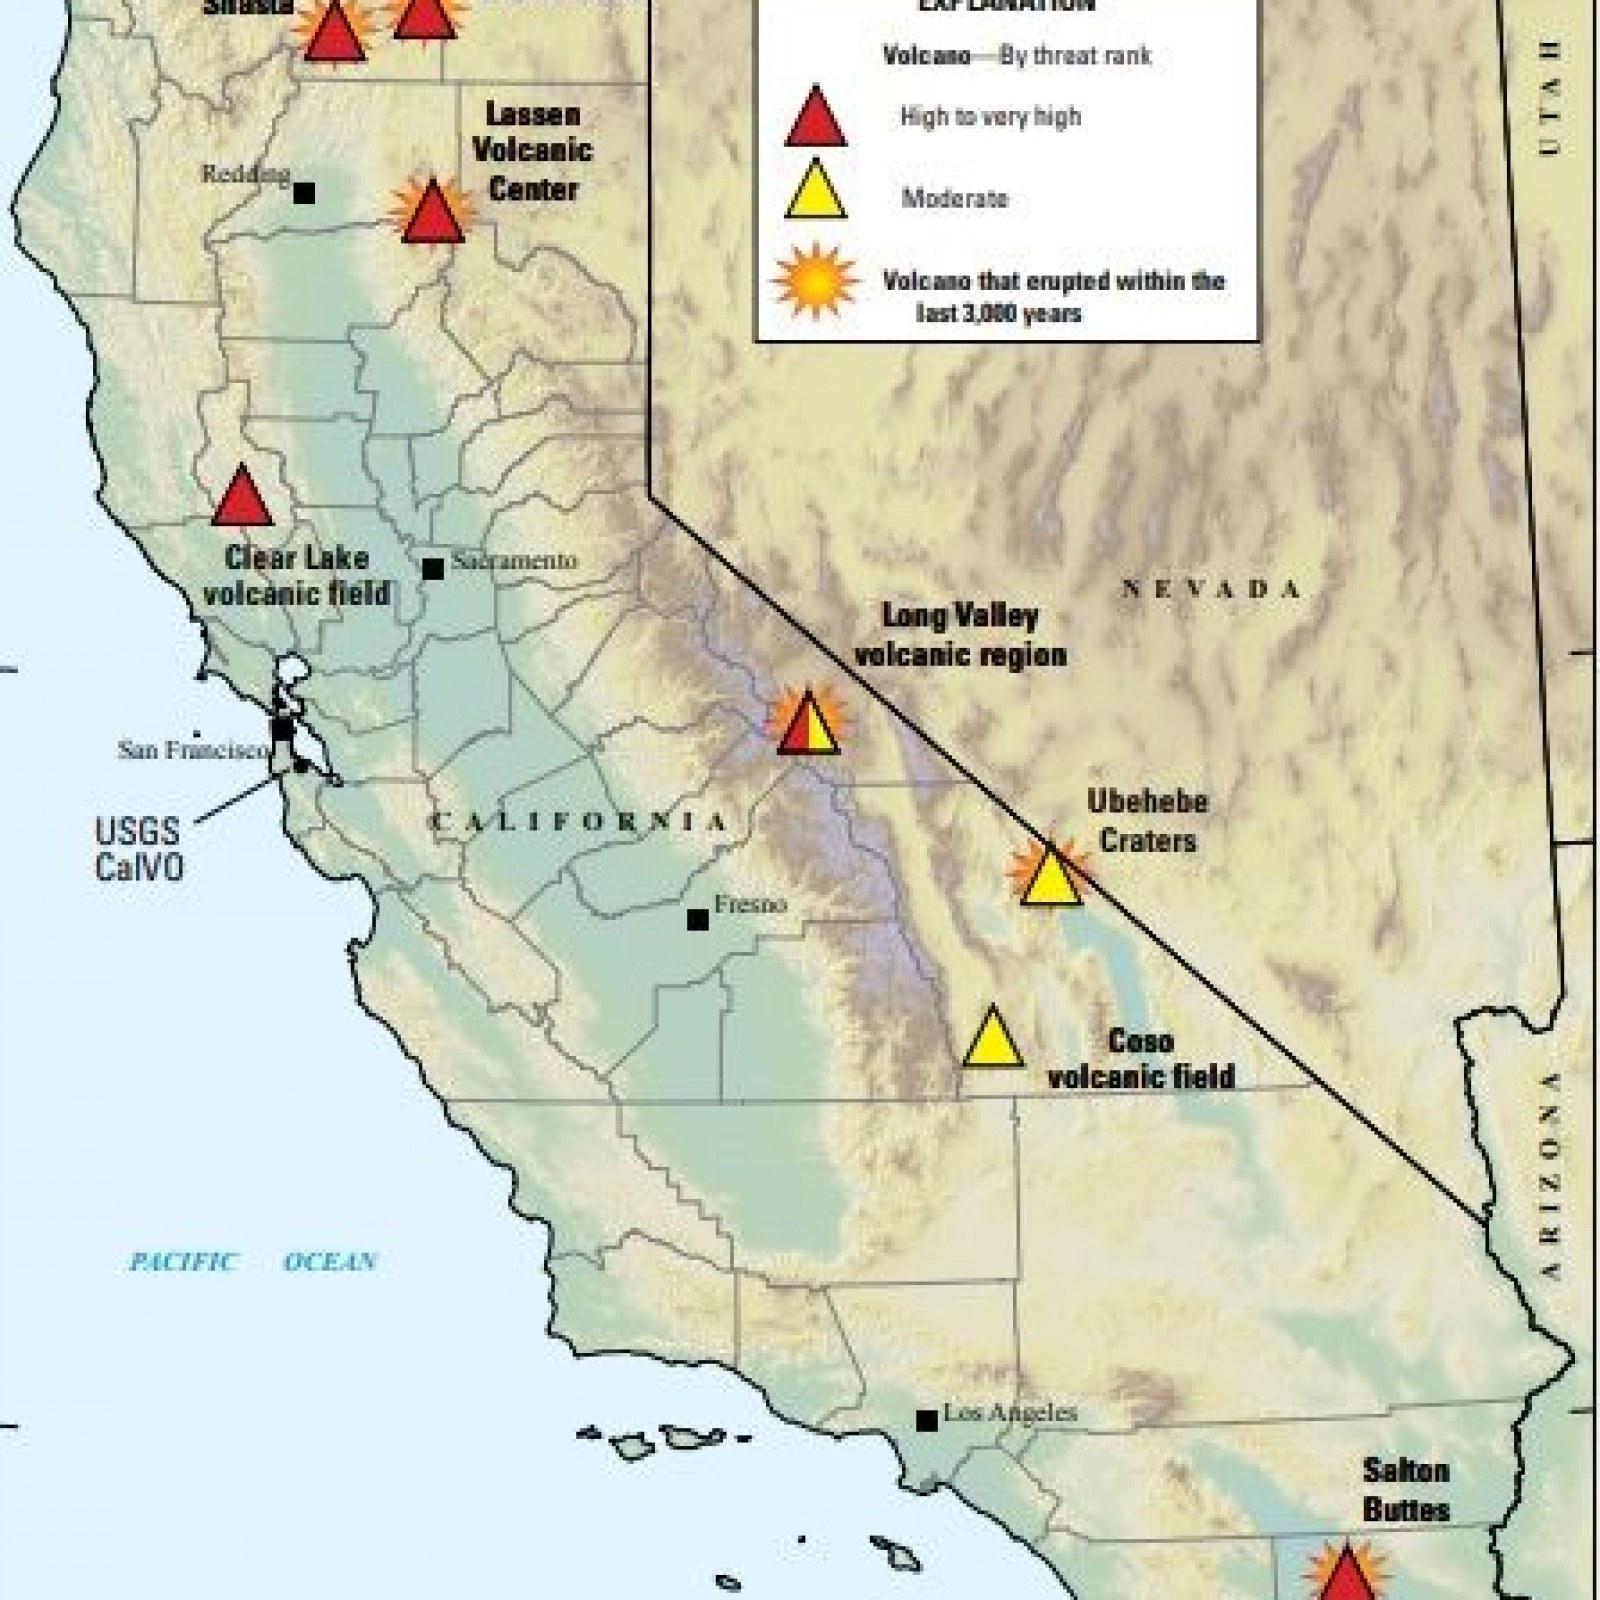 Forget San Andreas—California's Next Big Hazard Could be a ... on san andreas strike-slip faults, hayward fault map of area, fog map bay area, silicon valley map bay area, southern california faults, seismic hazard map bay area, earthquakes in california, joshua tree national park, fault line map sf bay area, california map bay area, maps of san diego area, crab flats big bear map of area, hayward fault map bay area, garlock fault, san jacinto fault zone, earthquake map bay area, silicon valley, 1906 san francisco earthquake, mojave desert, faultlines bay area, carrizo plain, calaveras fault, mount shasta, hayward fault zone,